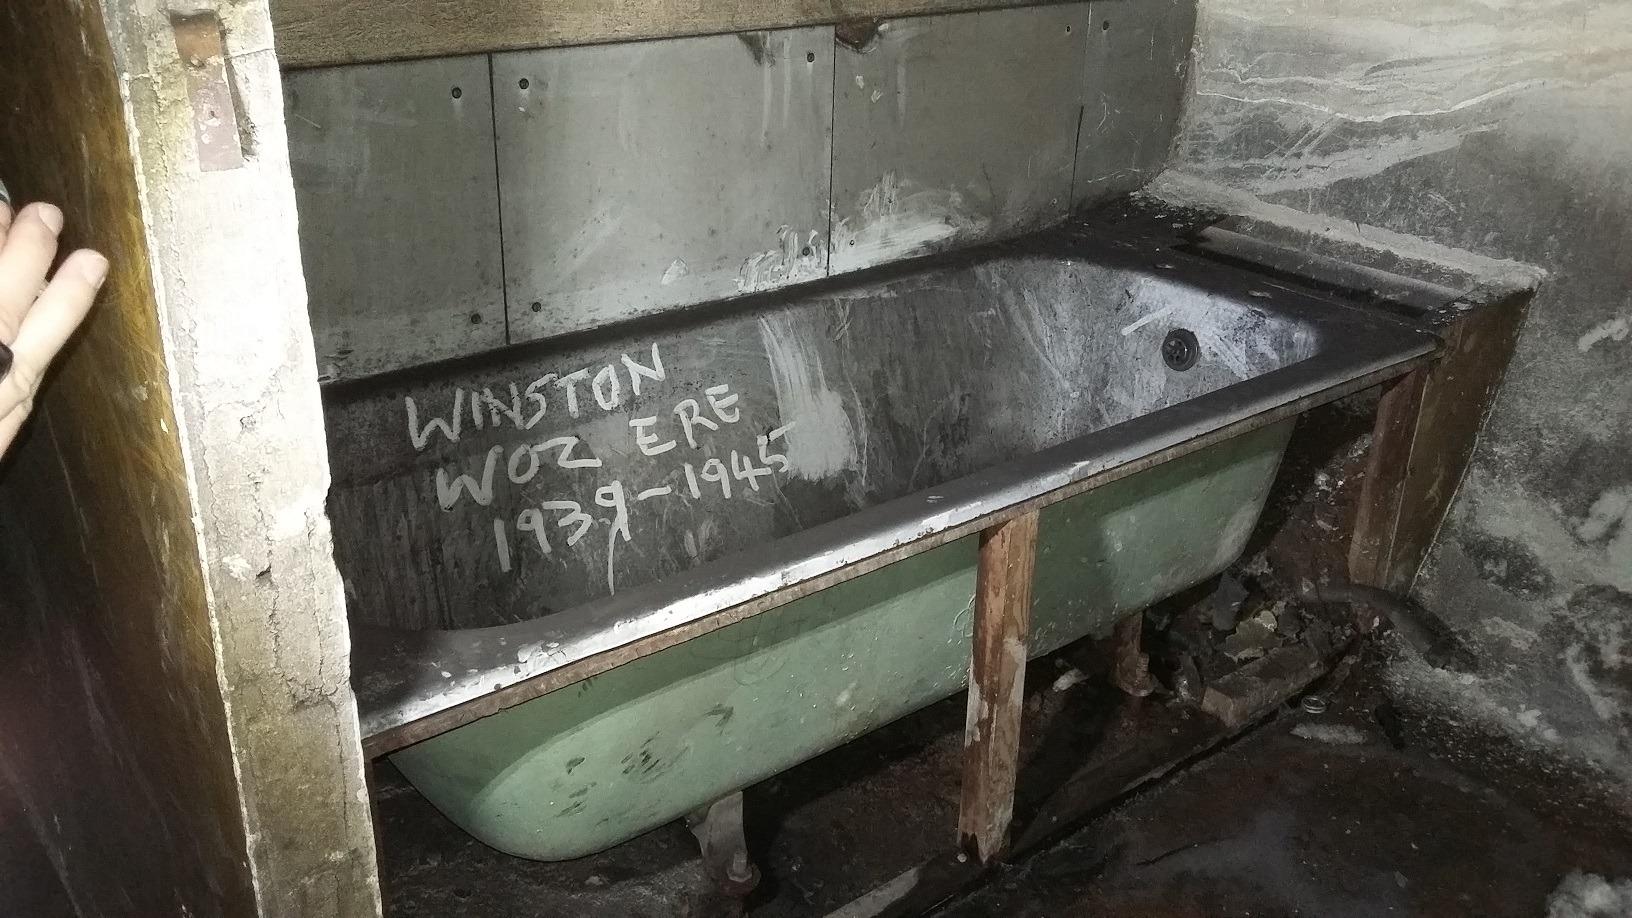 Winston's bath?